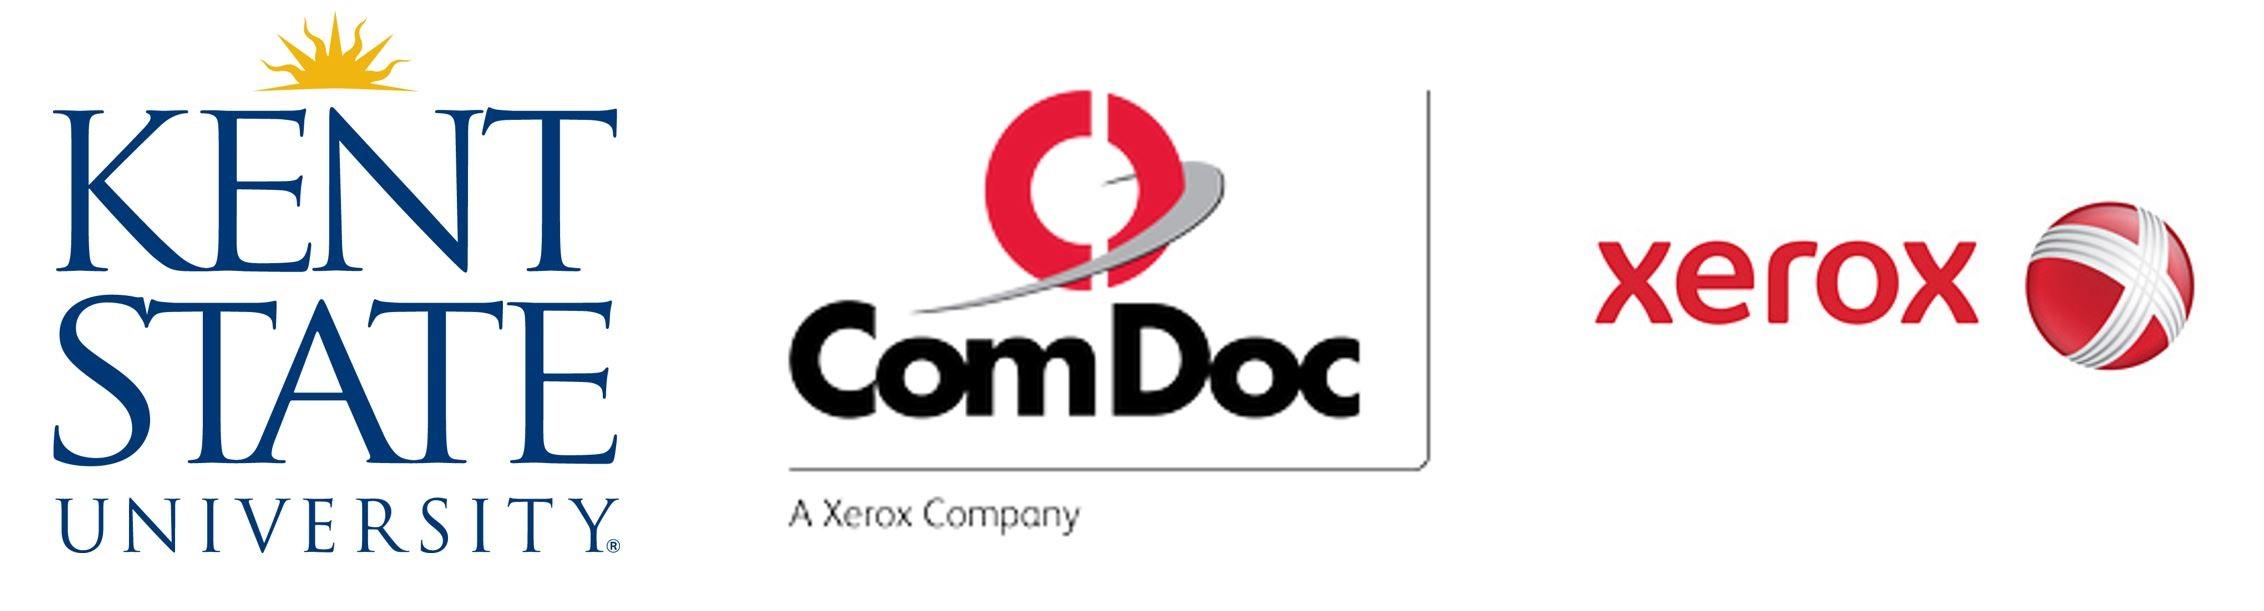 Kent State University, ComDoc, and Xerox Logos